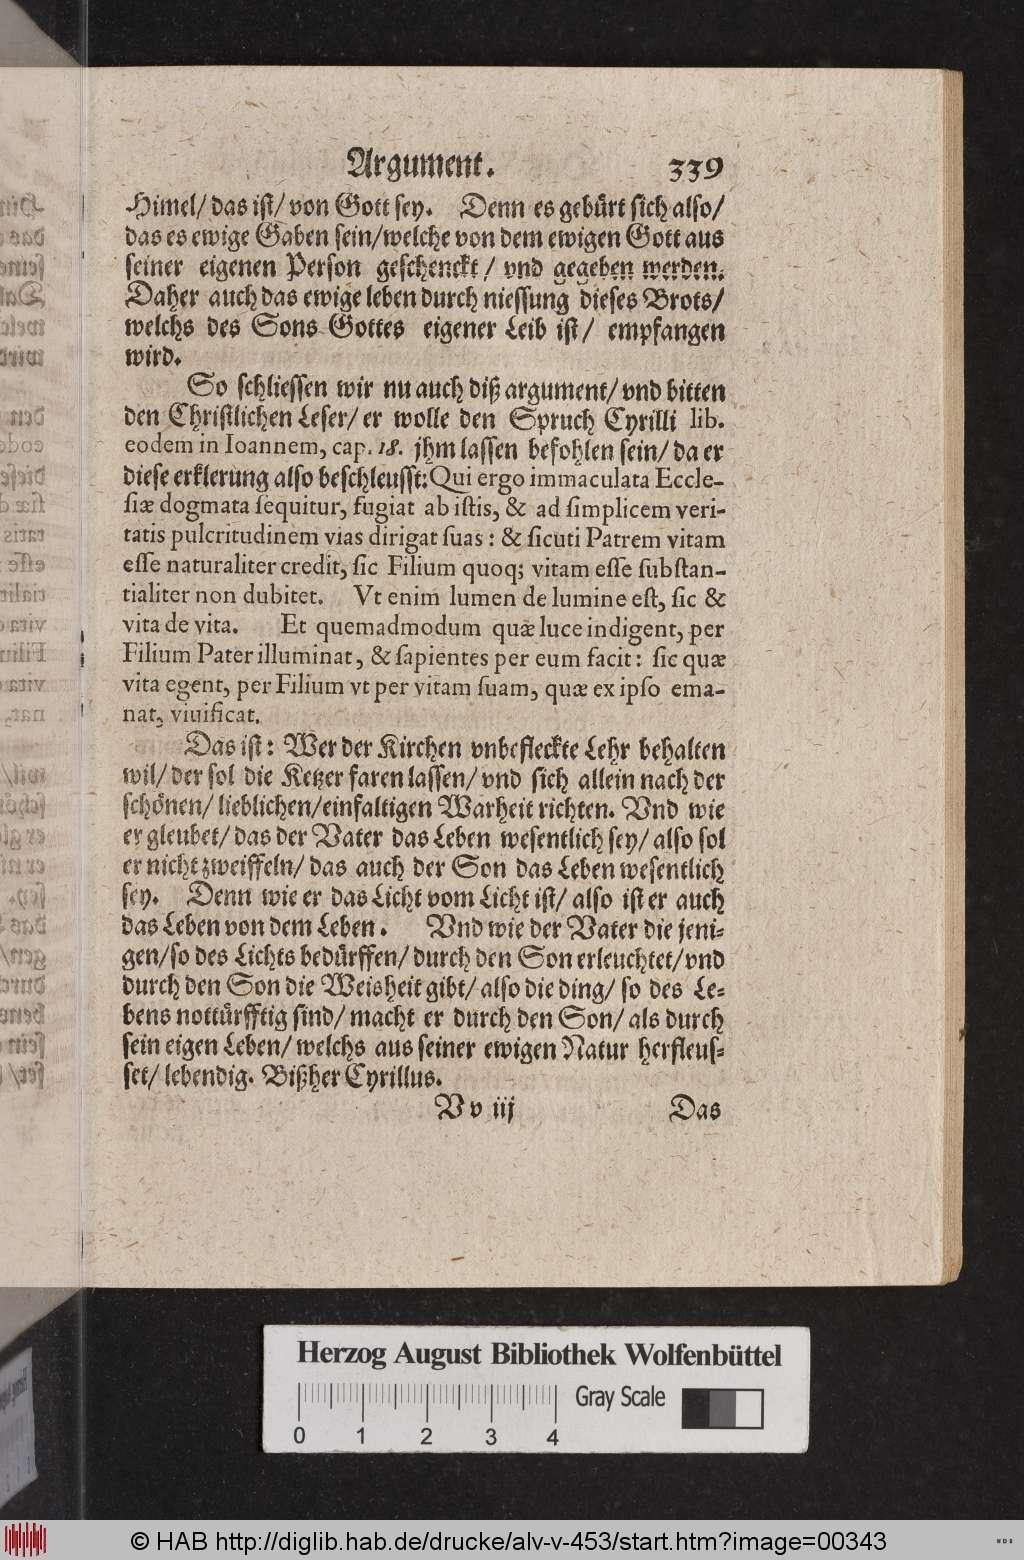 http://diglib.hab.de/drucke/alv-v-453/00343.jpg